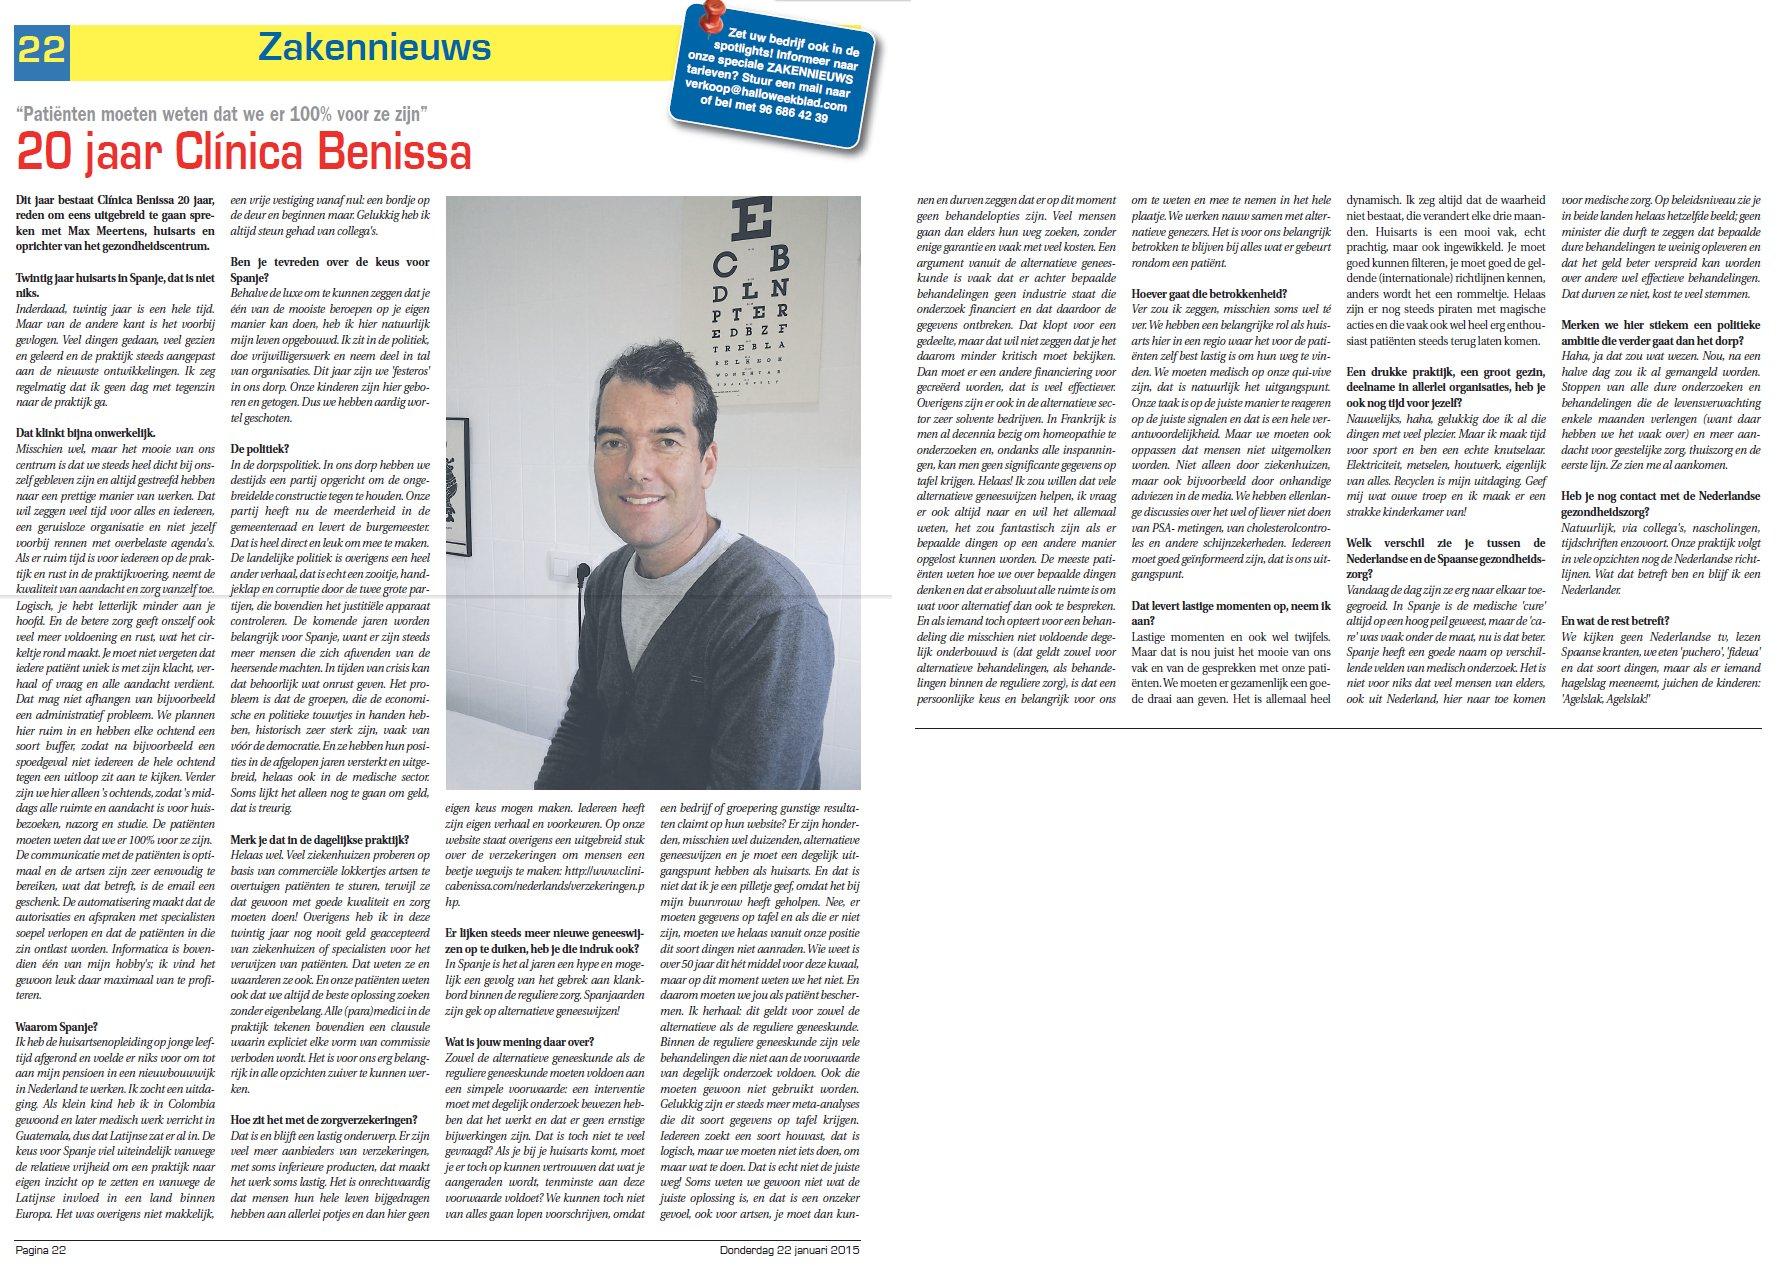 Interview Dr. Meertens Hallo Weekblad